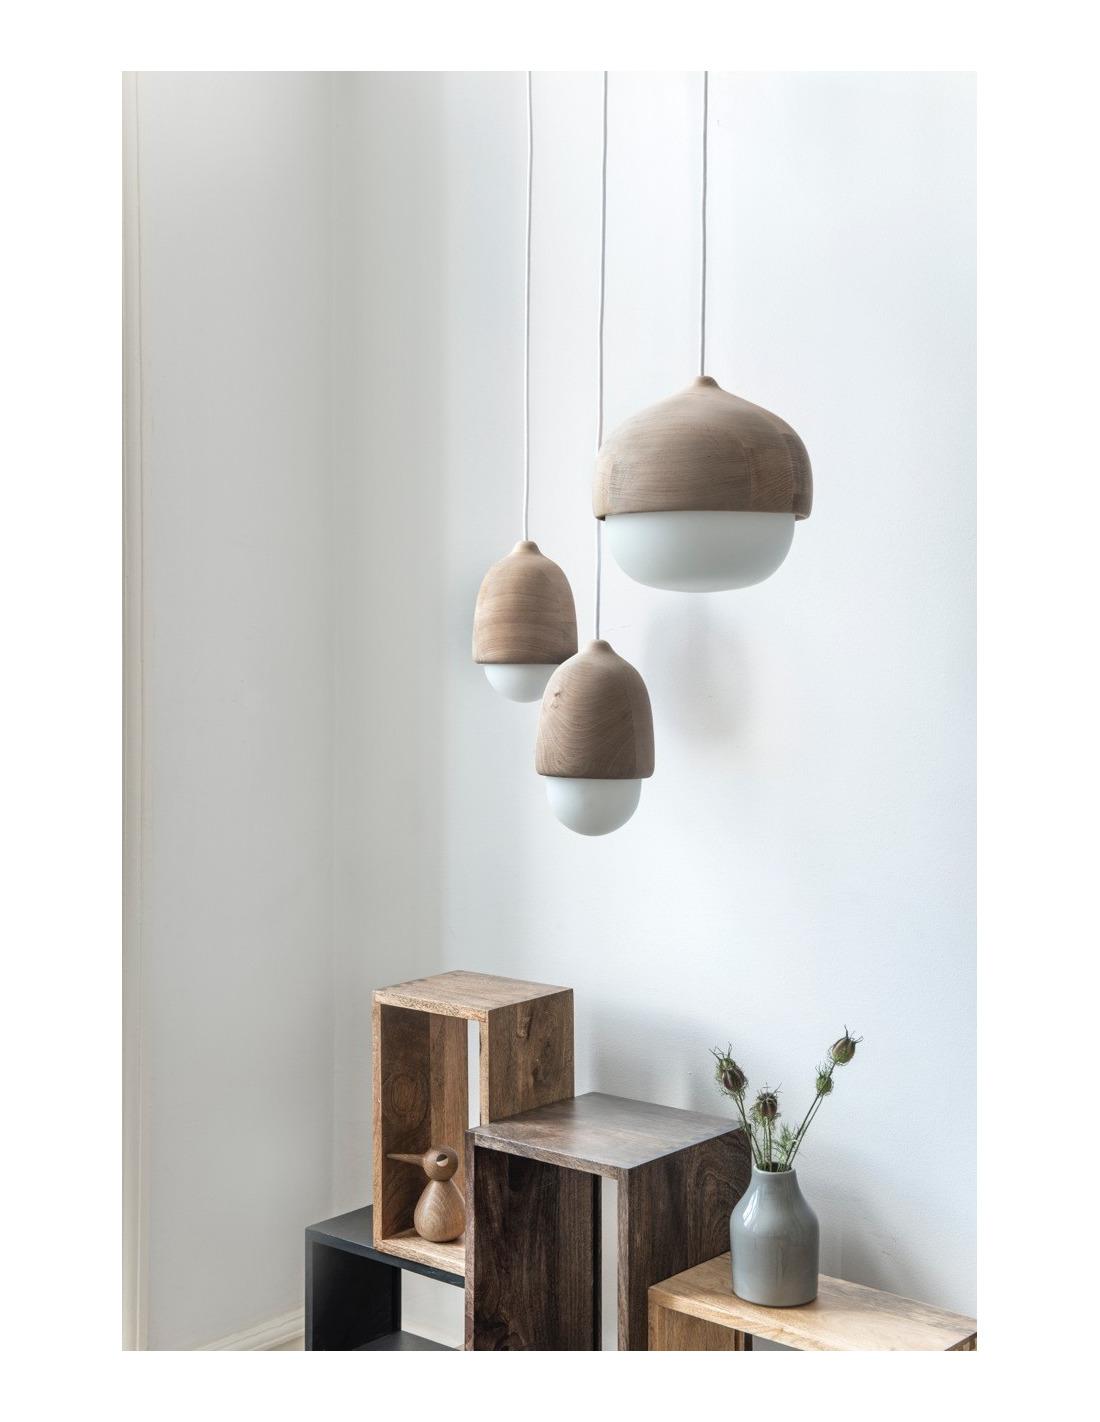 suspension en bois et verre souffl terho lamp m au design scandinave otoko. Black Bedroom Furniture Sets. Home Design Ideas